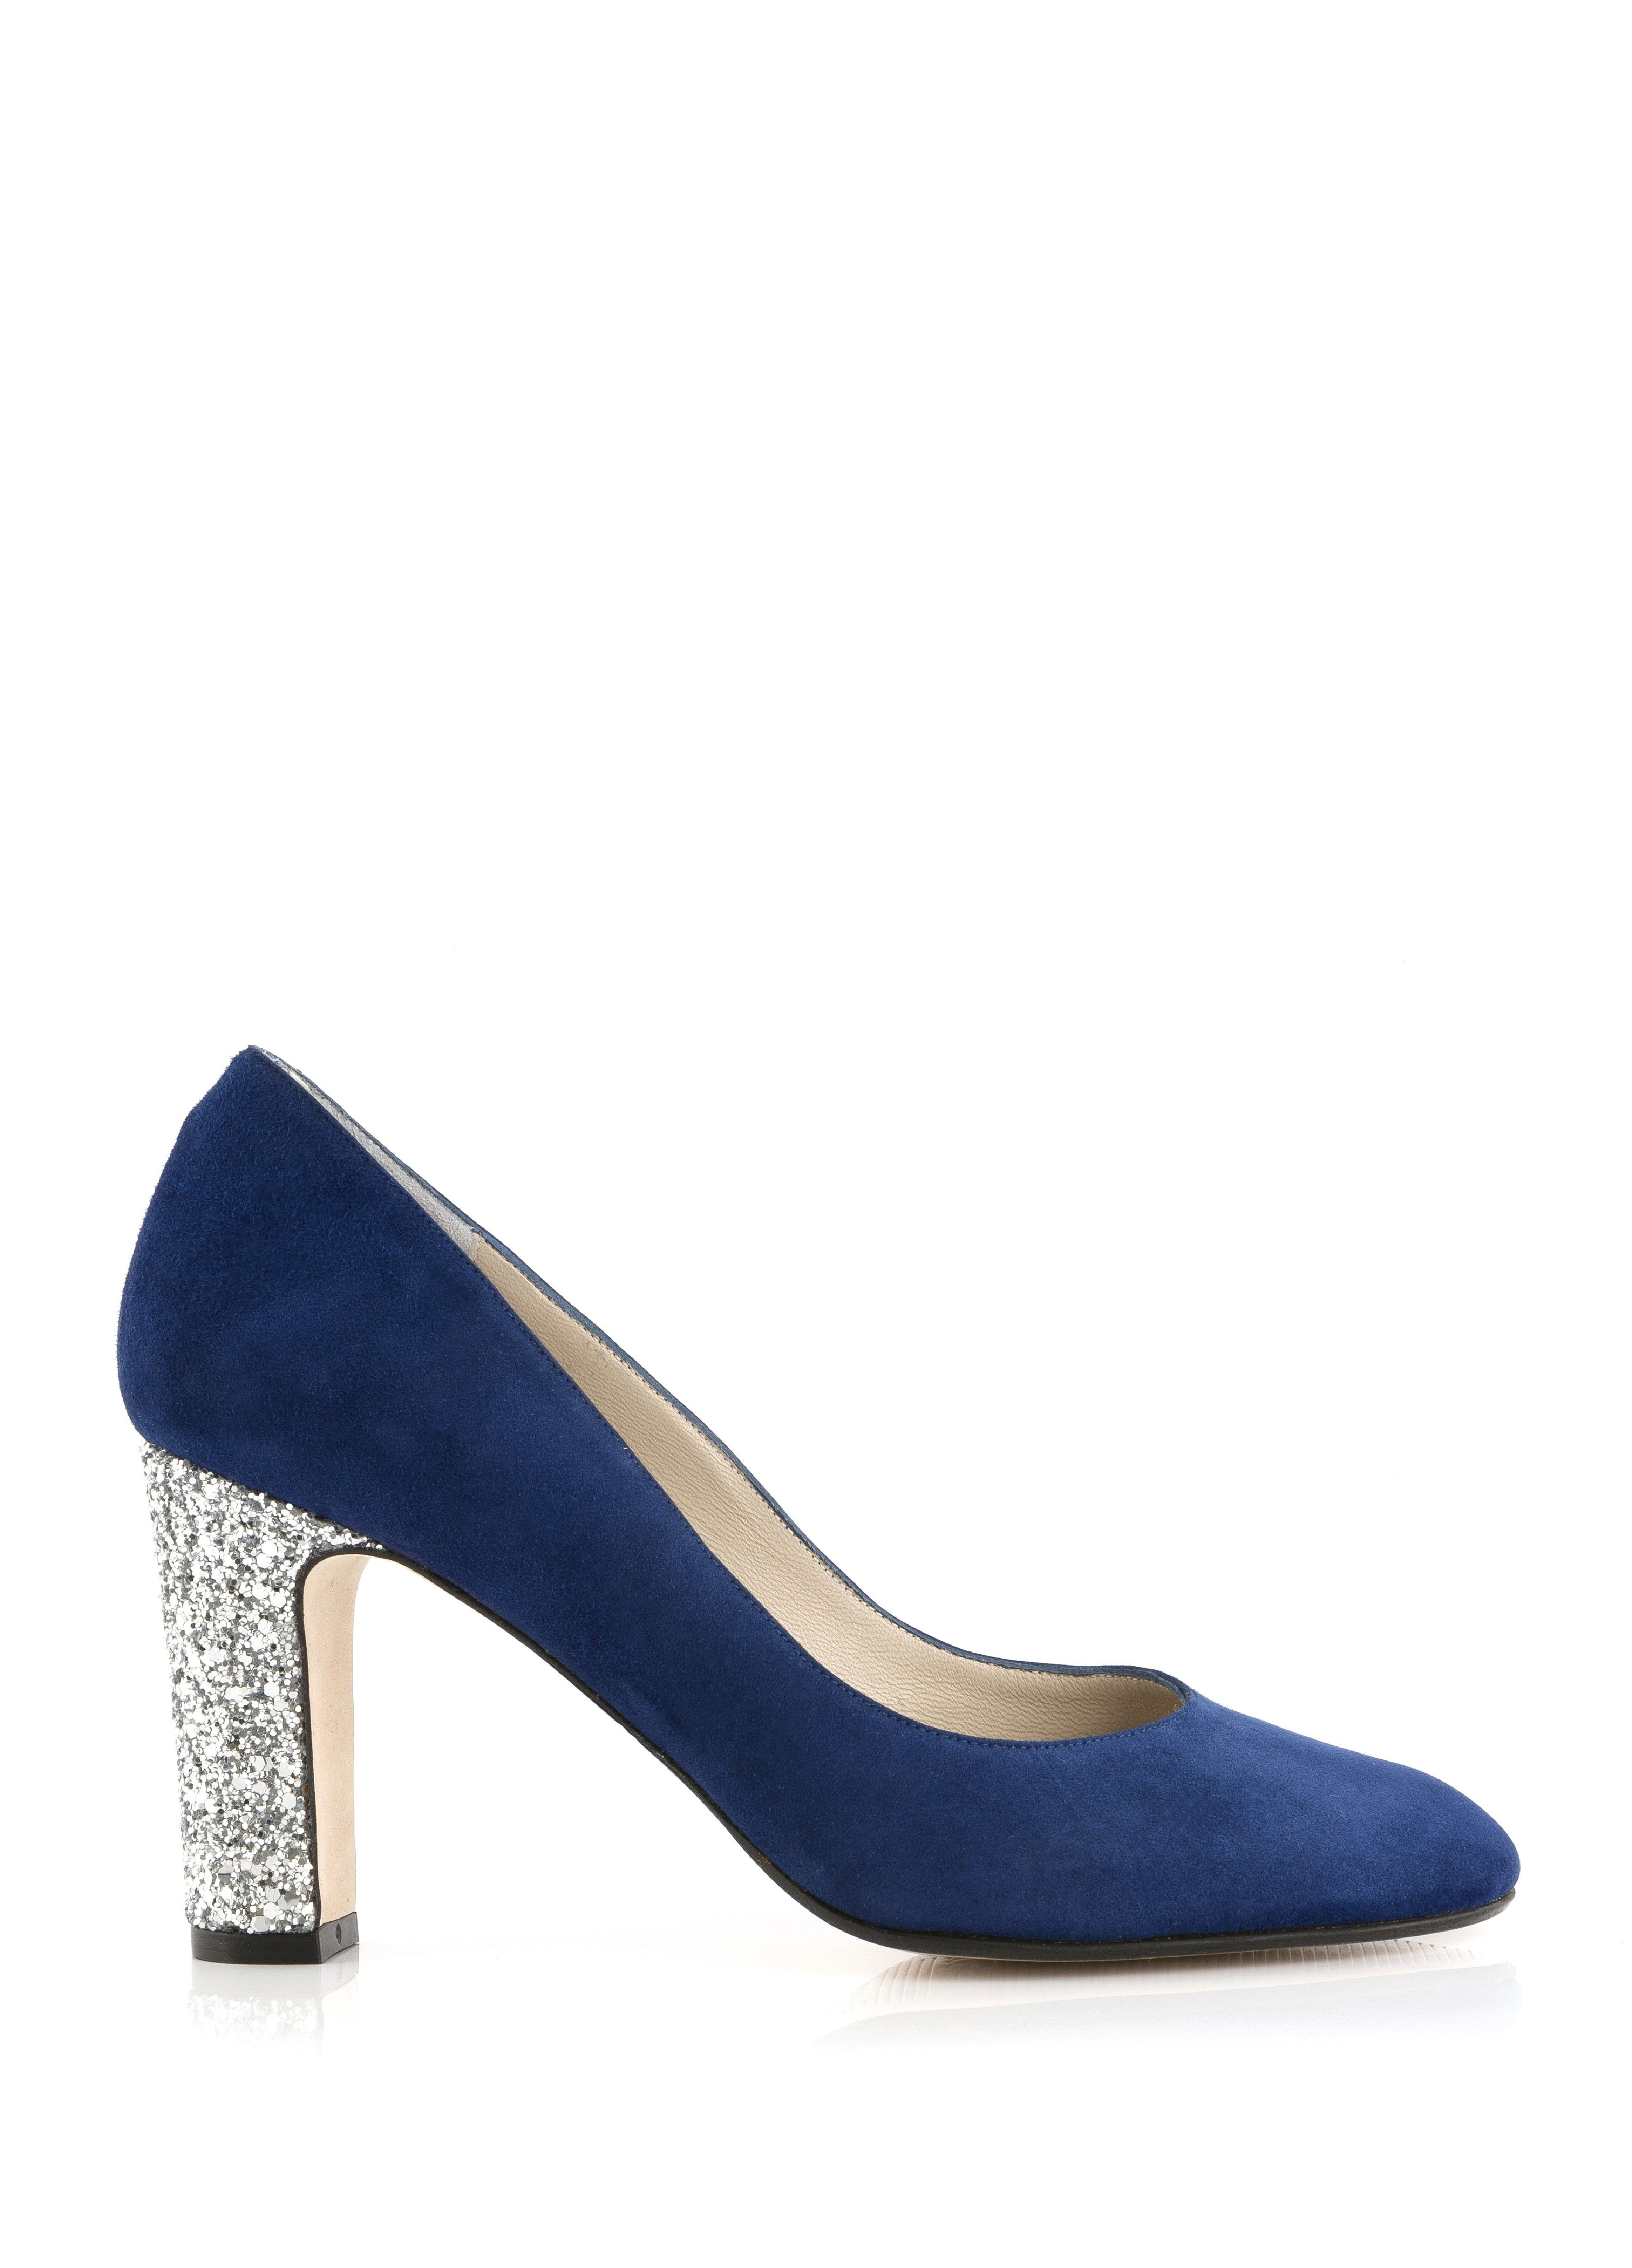 3a7ae9c8de22 Escarpin PIRALT Marine Escarpin Bleu, Escarpin Femme, Chaussures Femme,  Chaussures Bleues, Escarpins